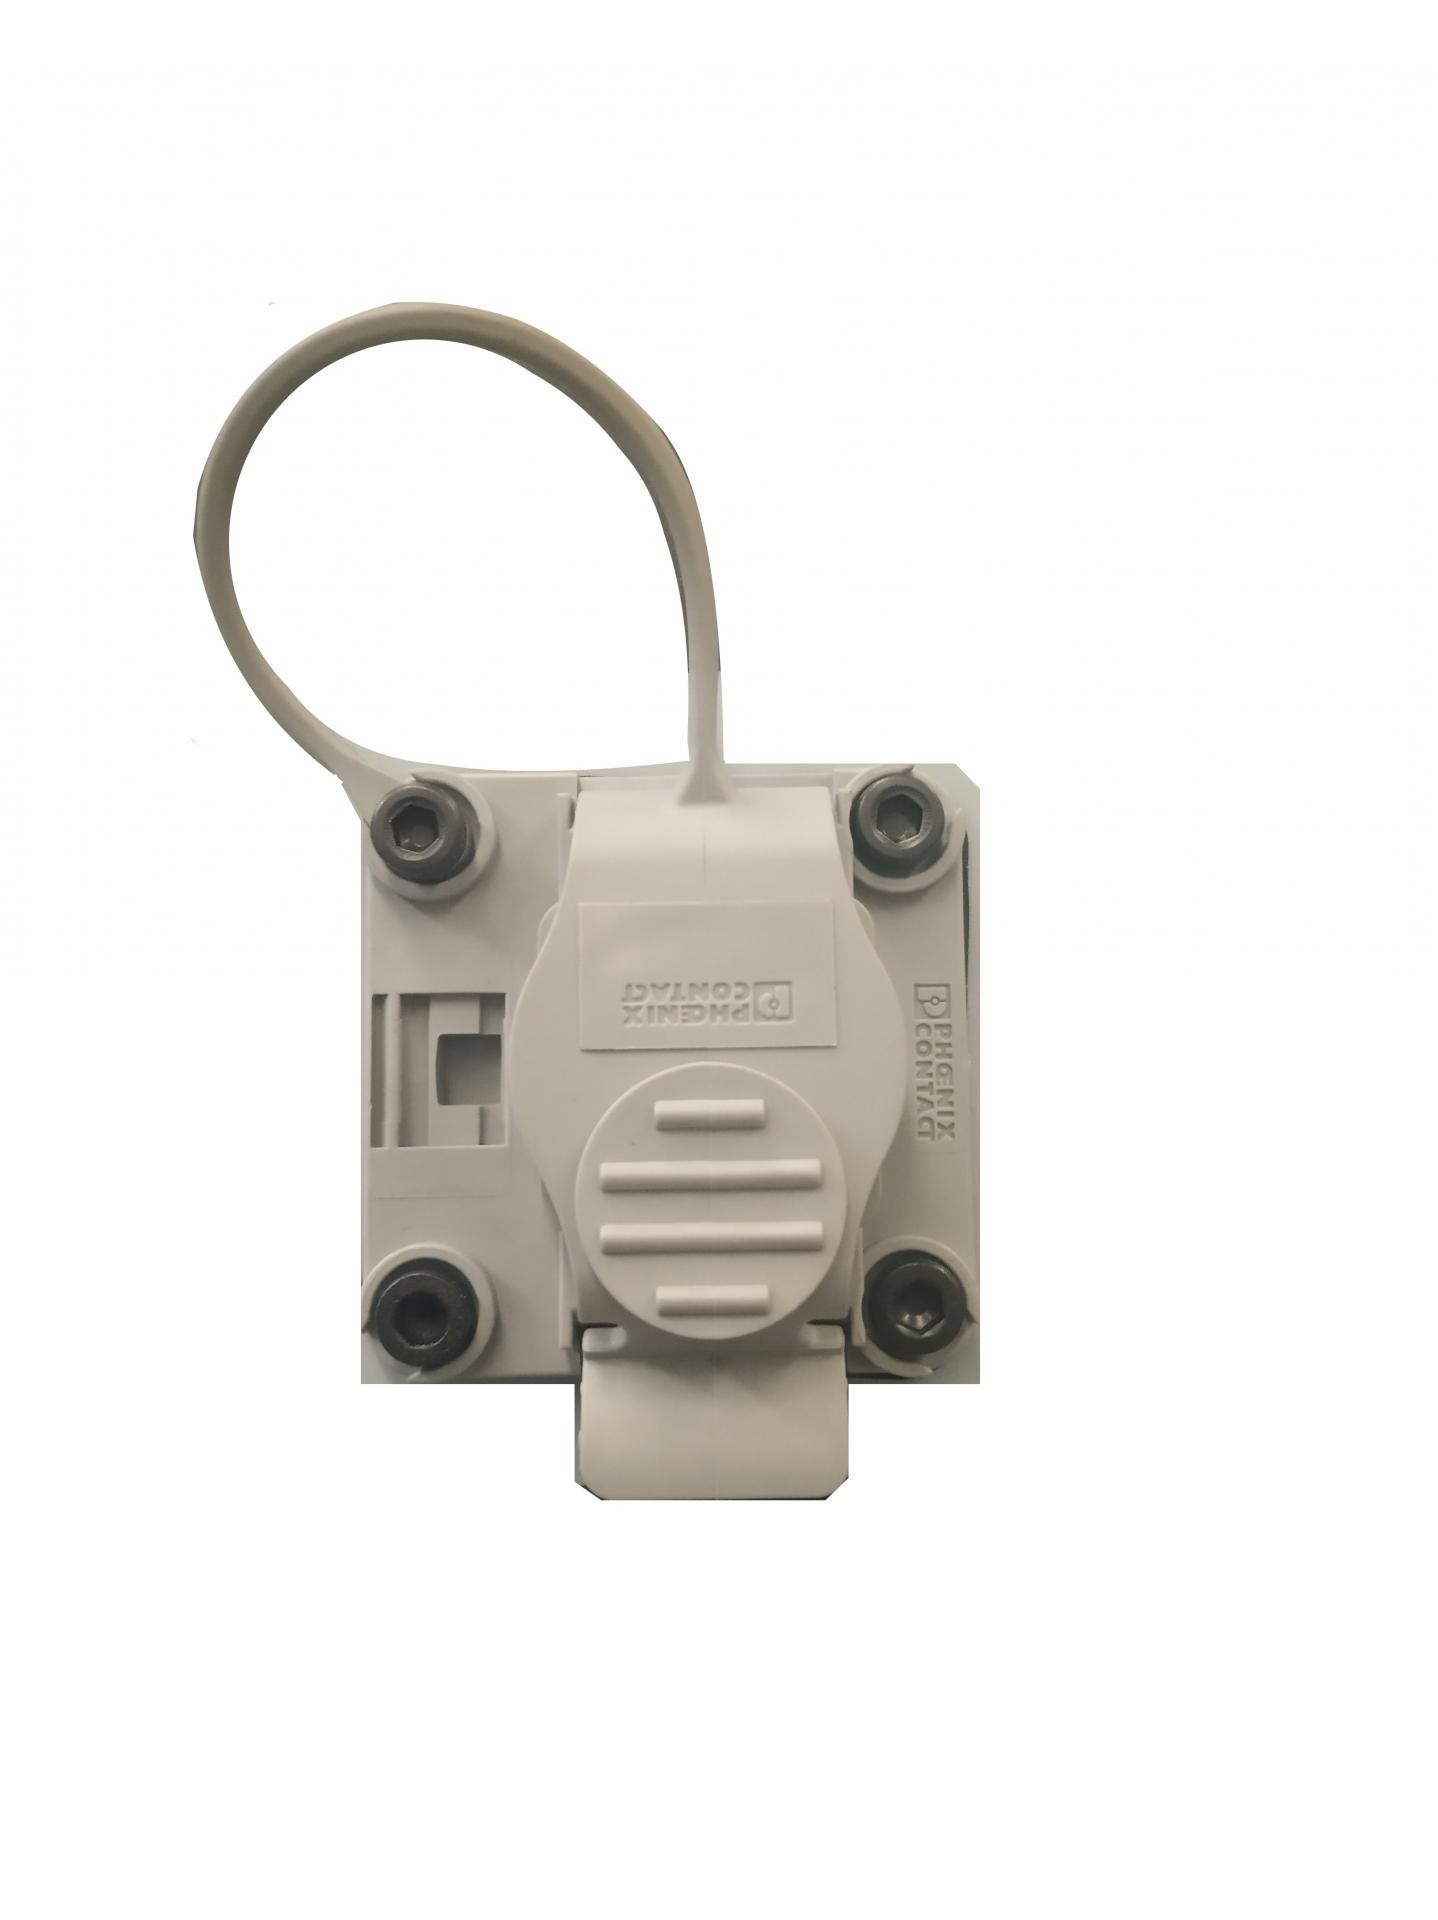 USB FRONTAL